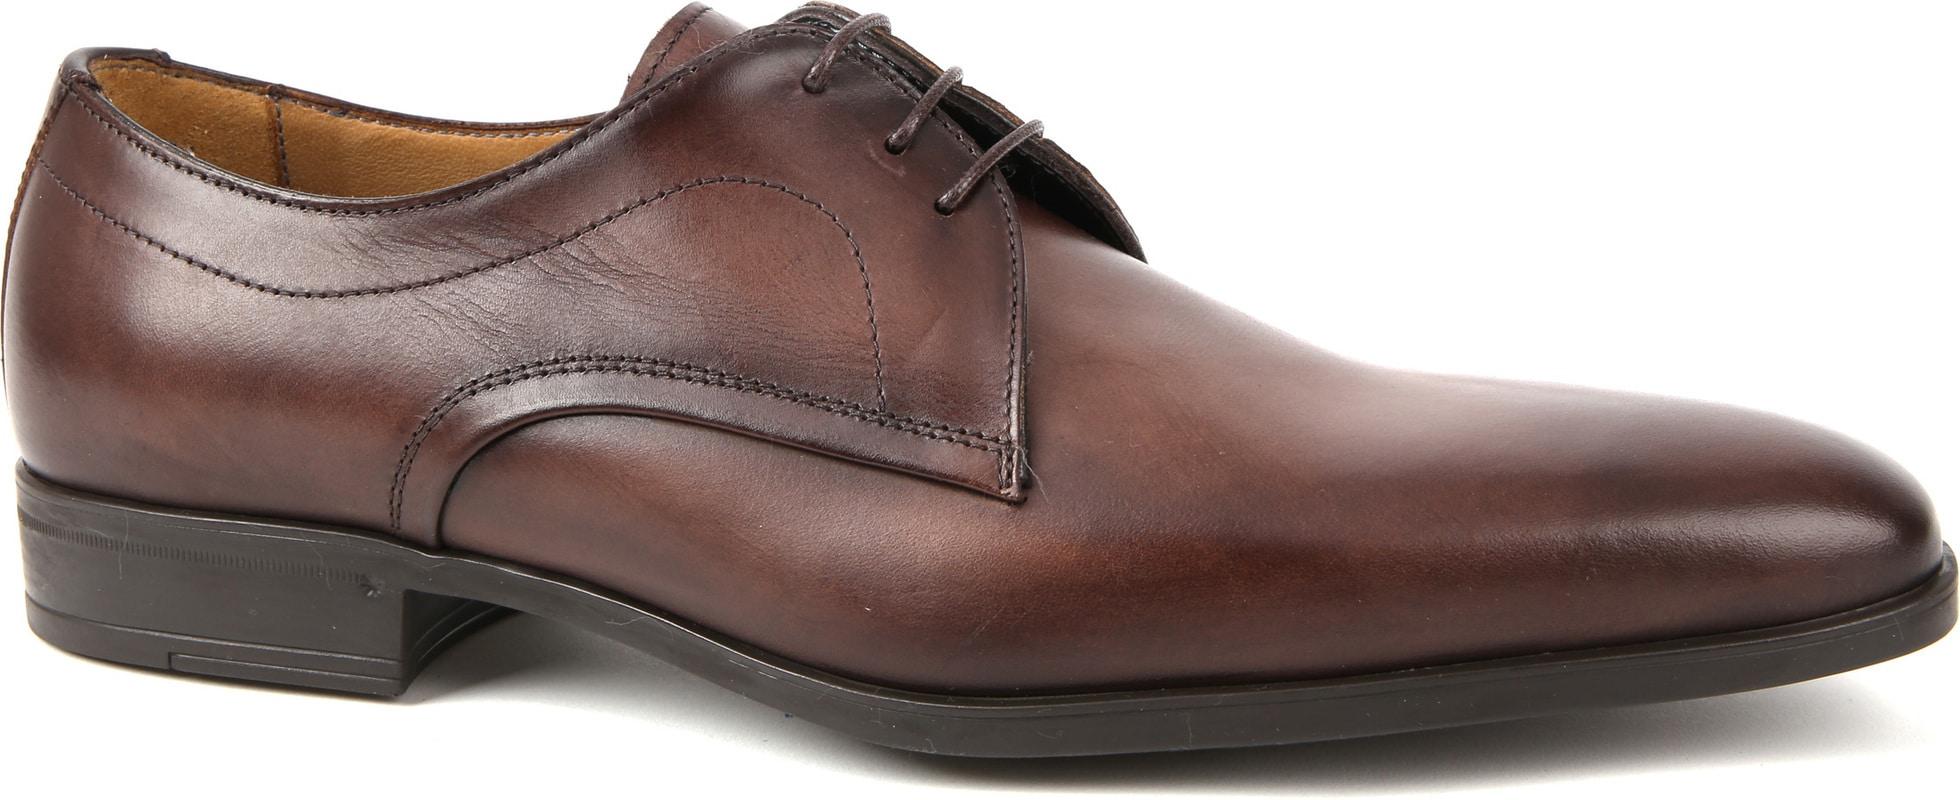 Giorgio Scandicci Shoe Deep Brown photo 0